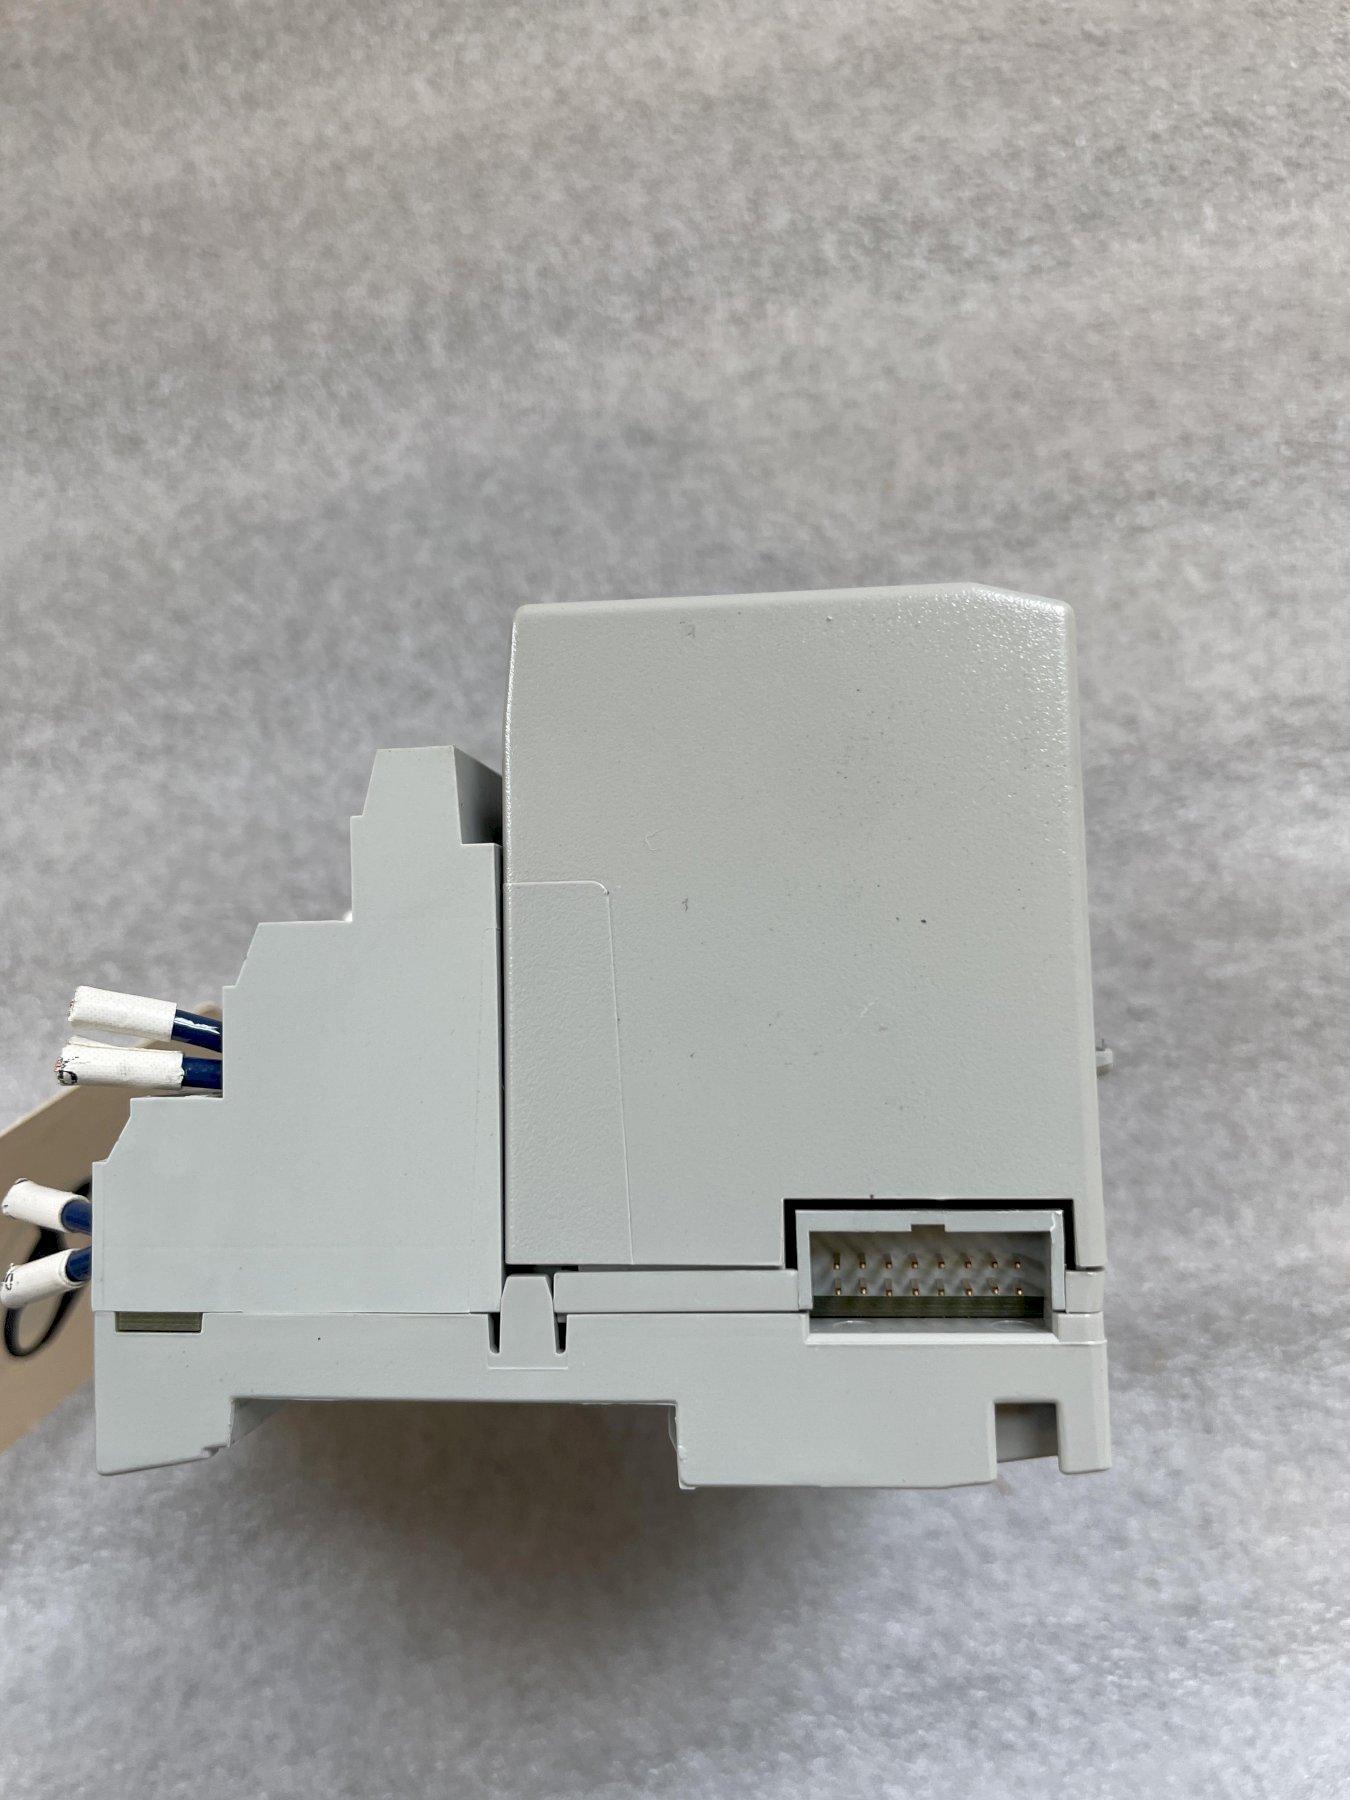 ALLEN BRADLEY Flex I/O 1794-OF4I Isolated Analog Output Module